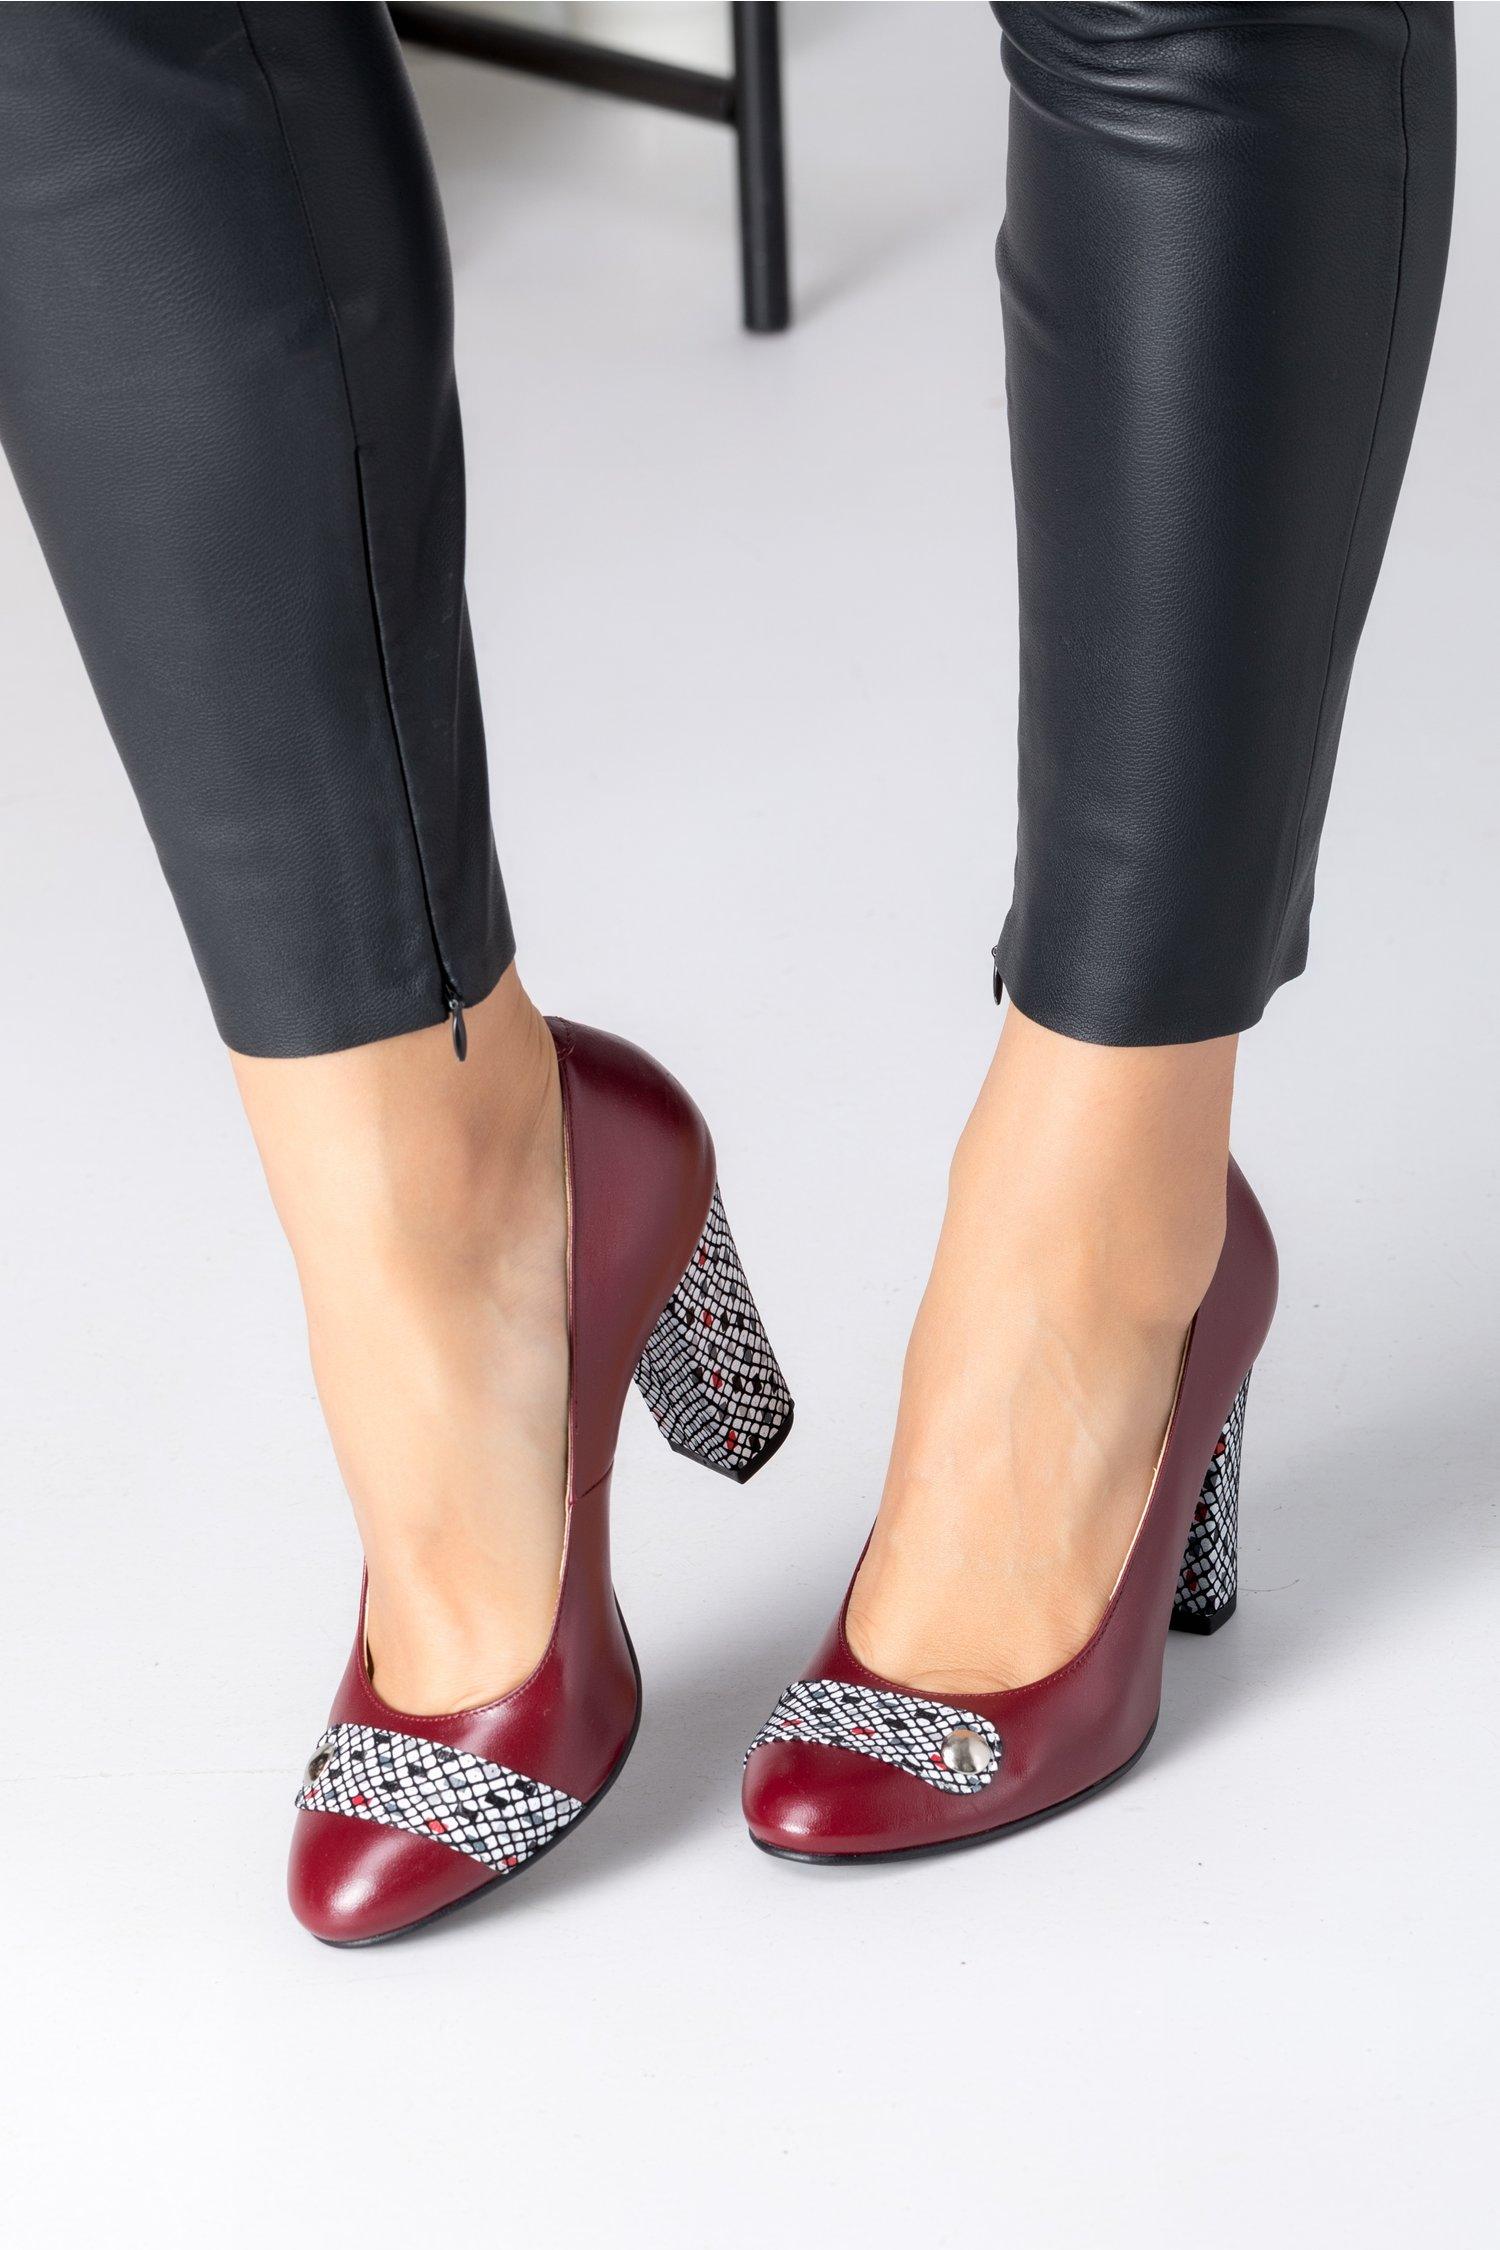 Pantofi dama bordo cu imprimeuri